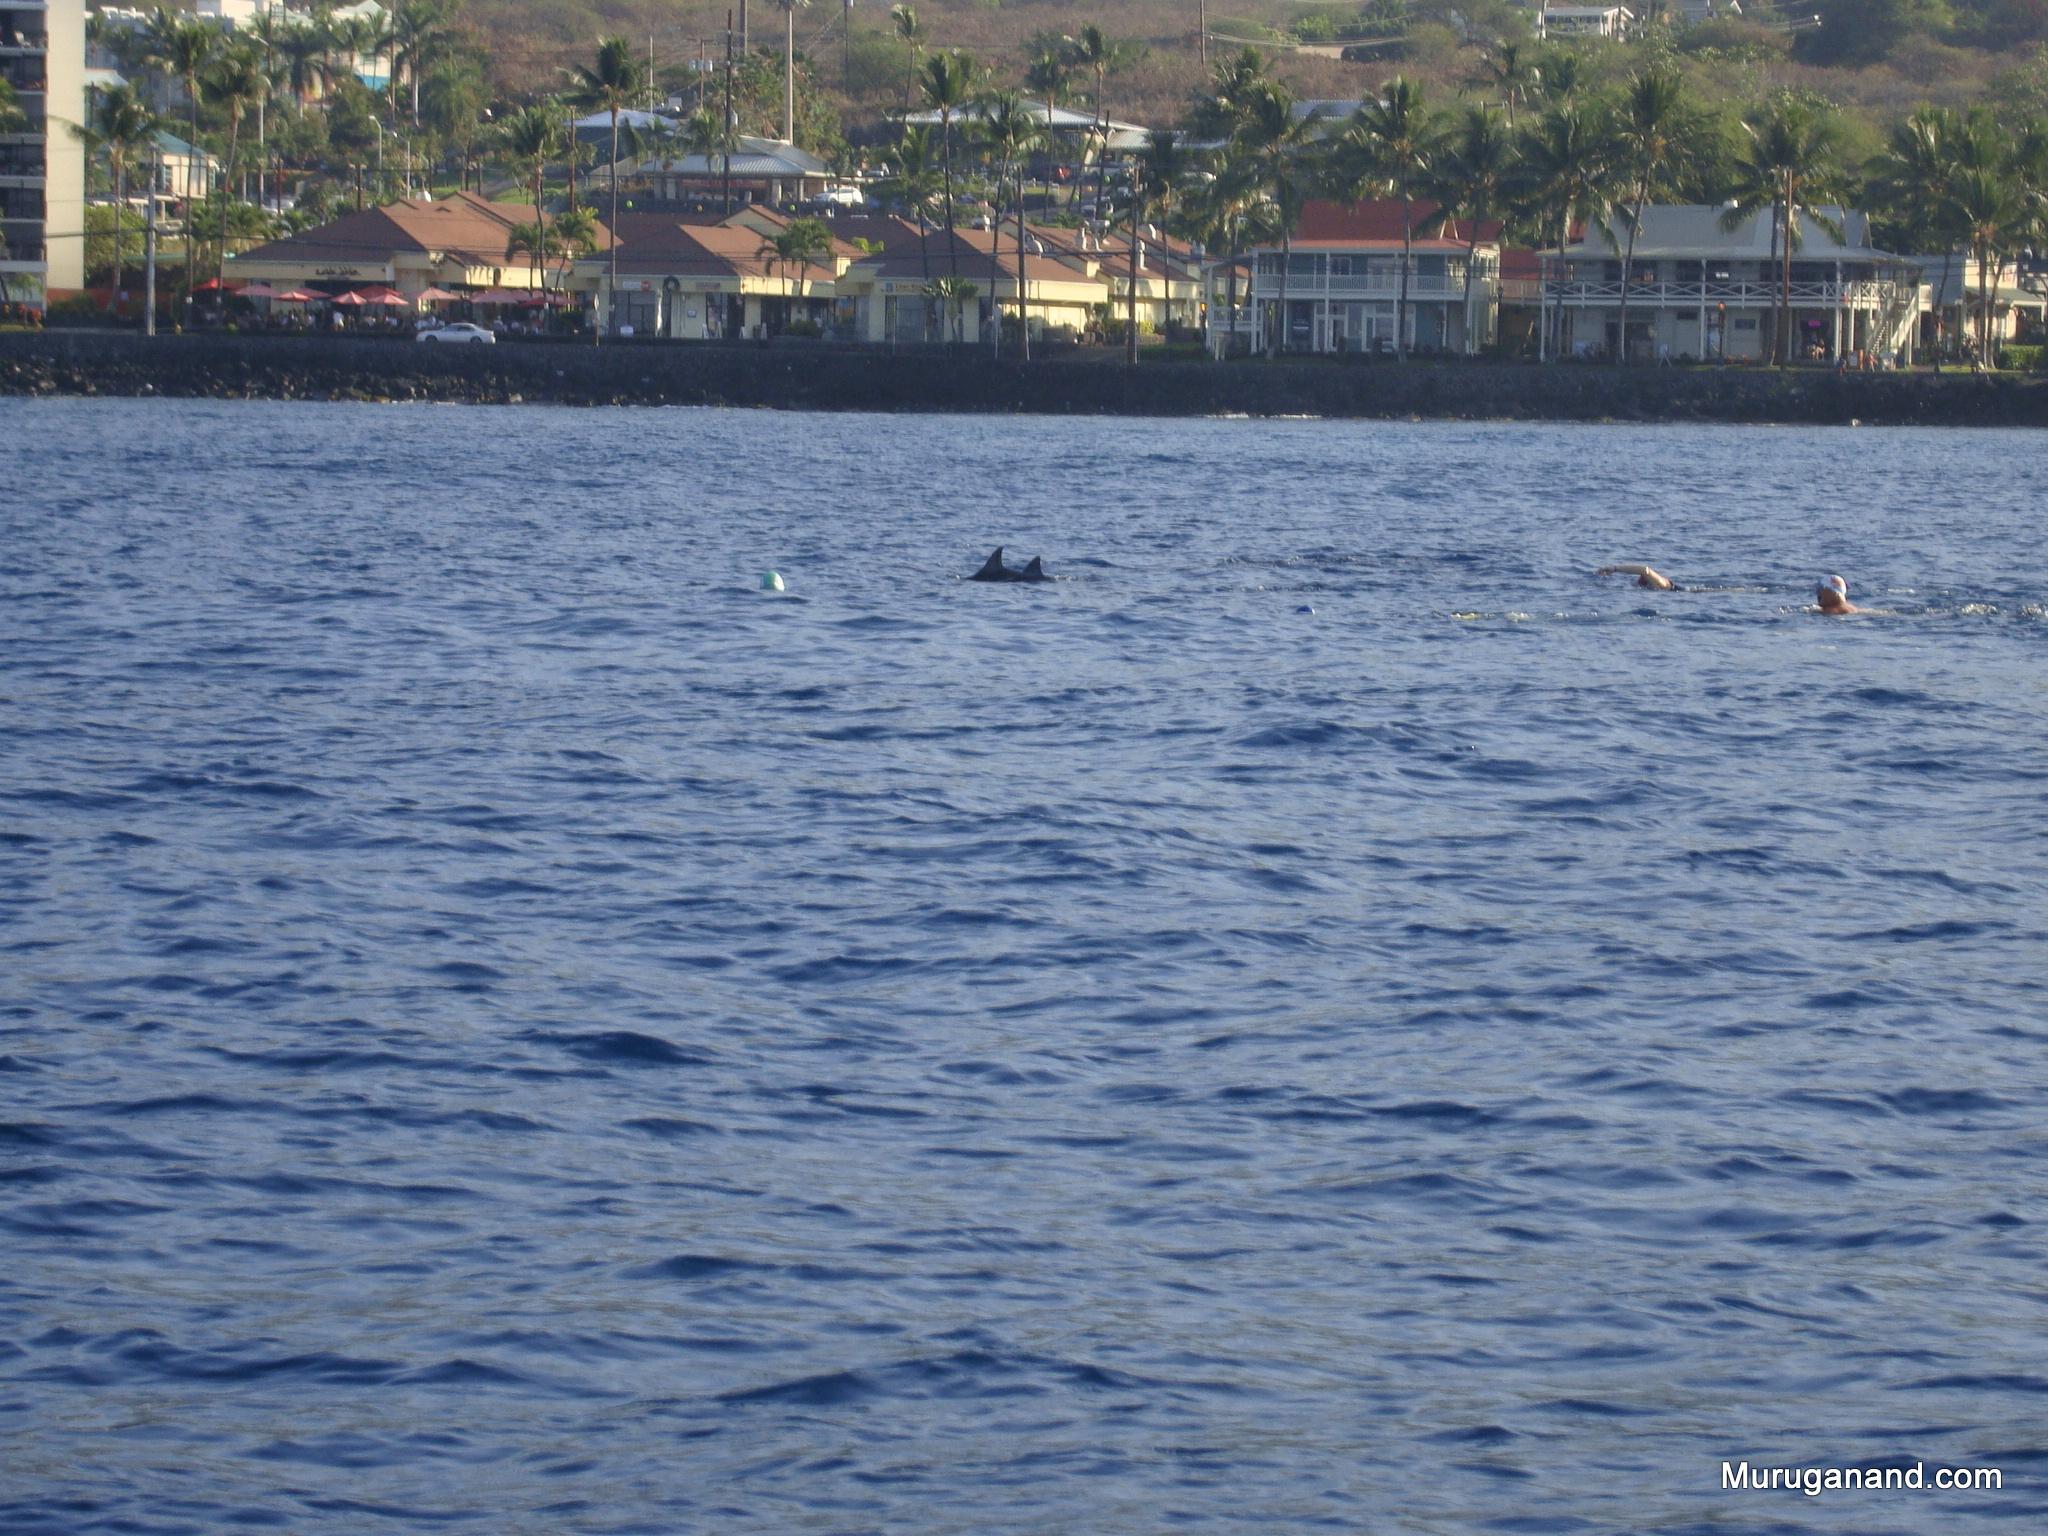 Dolphins while Rafting (Kona, Hawai'i)